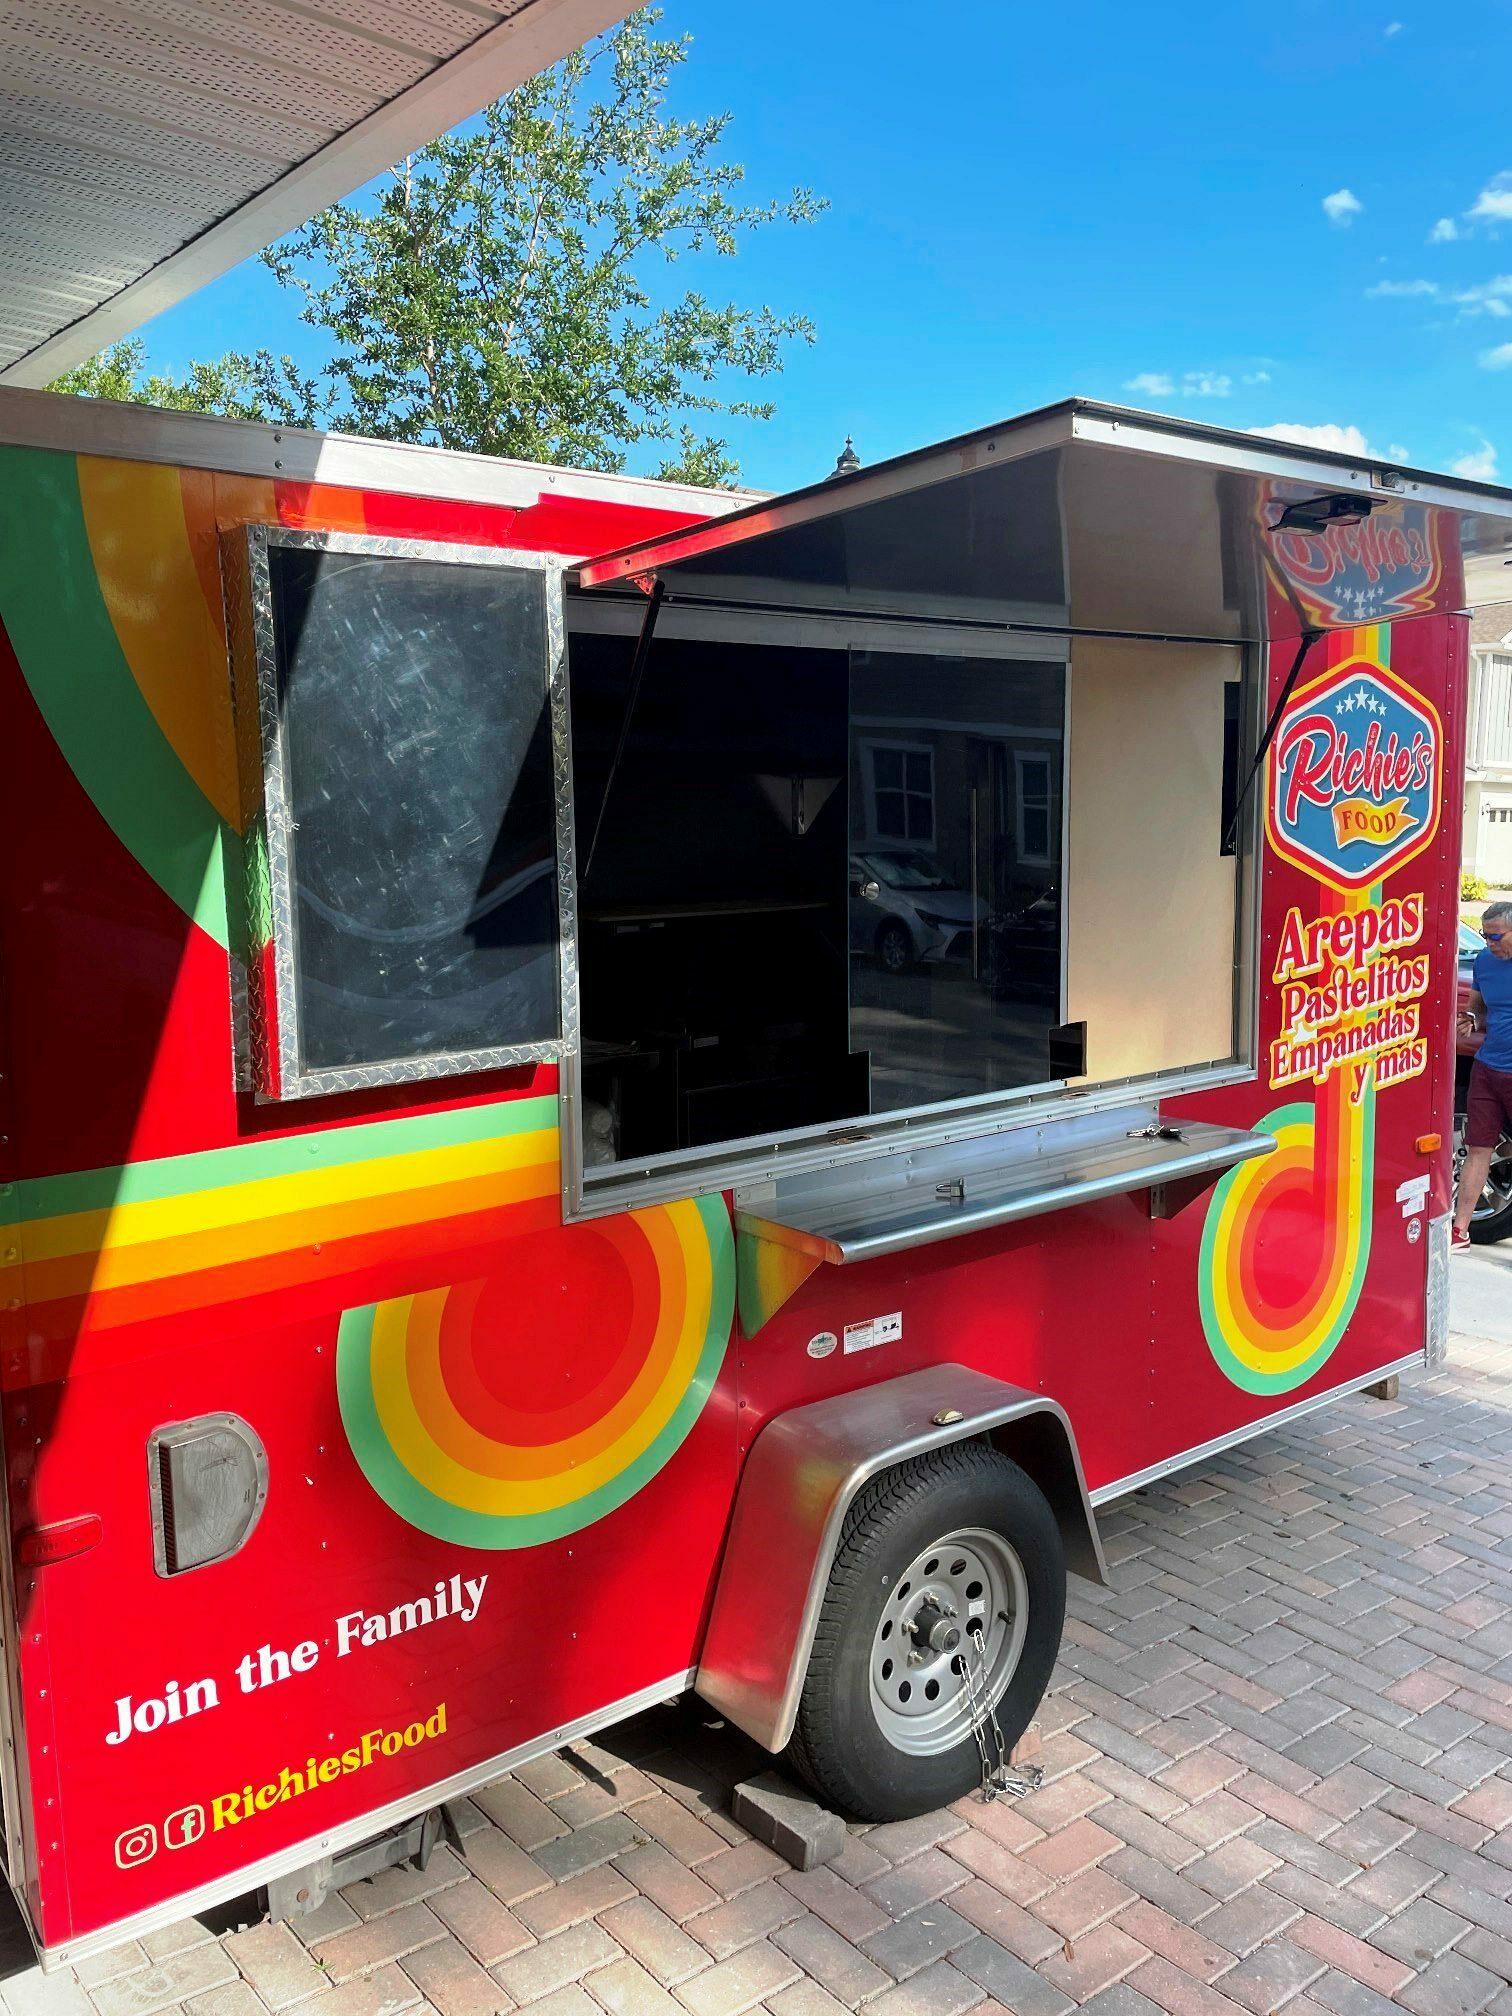 richies food truck